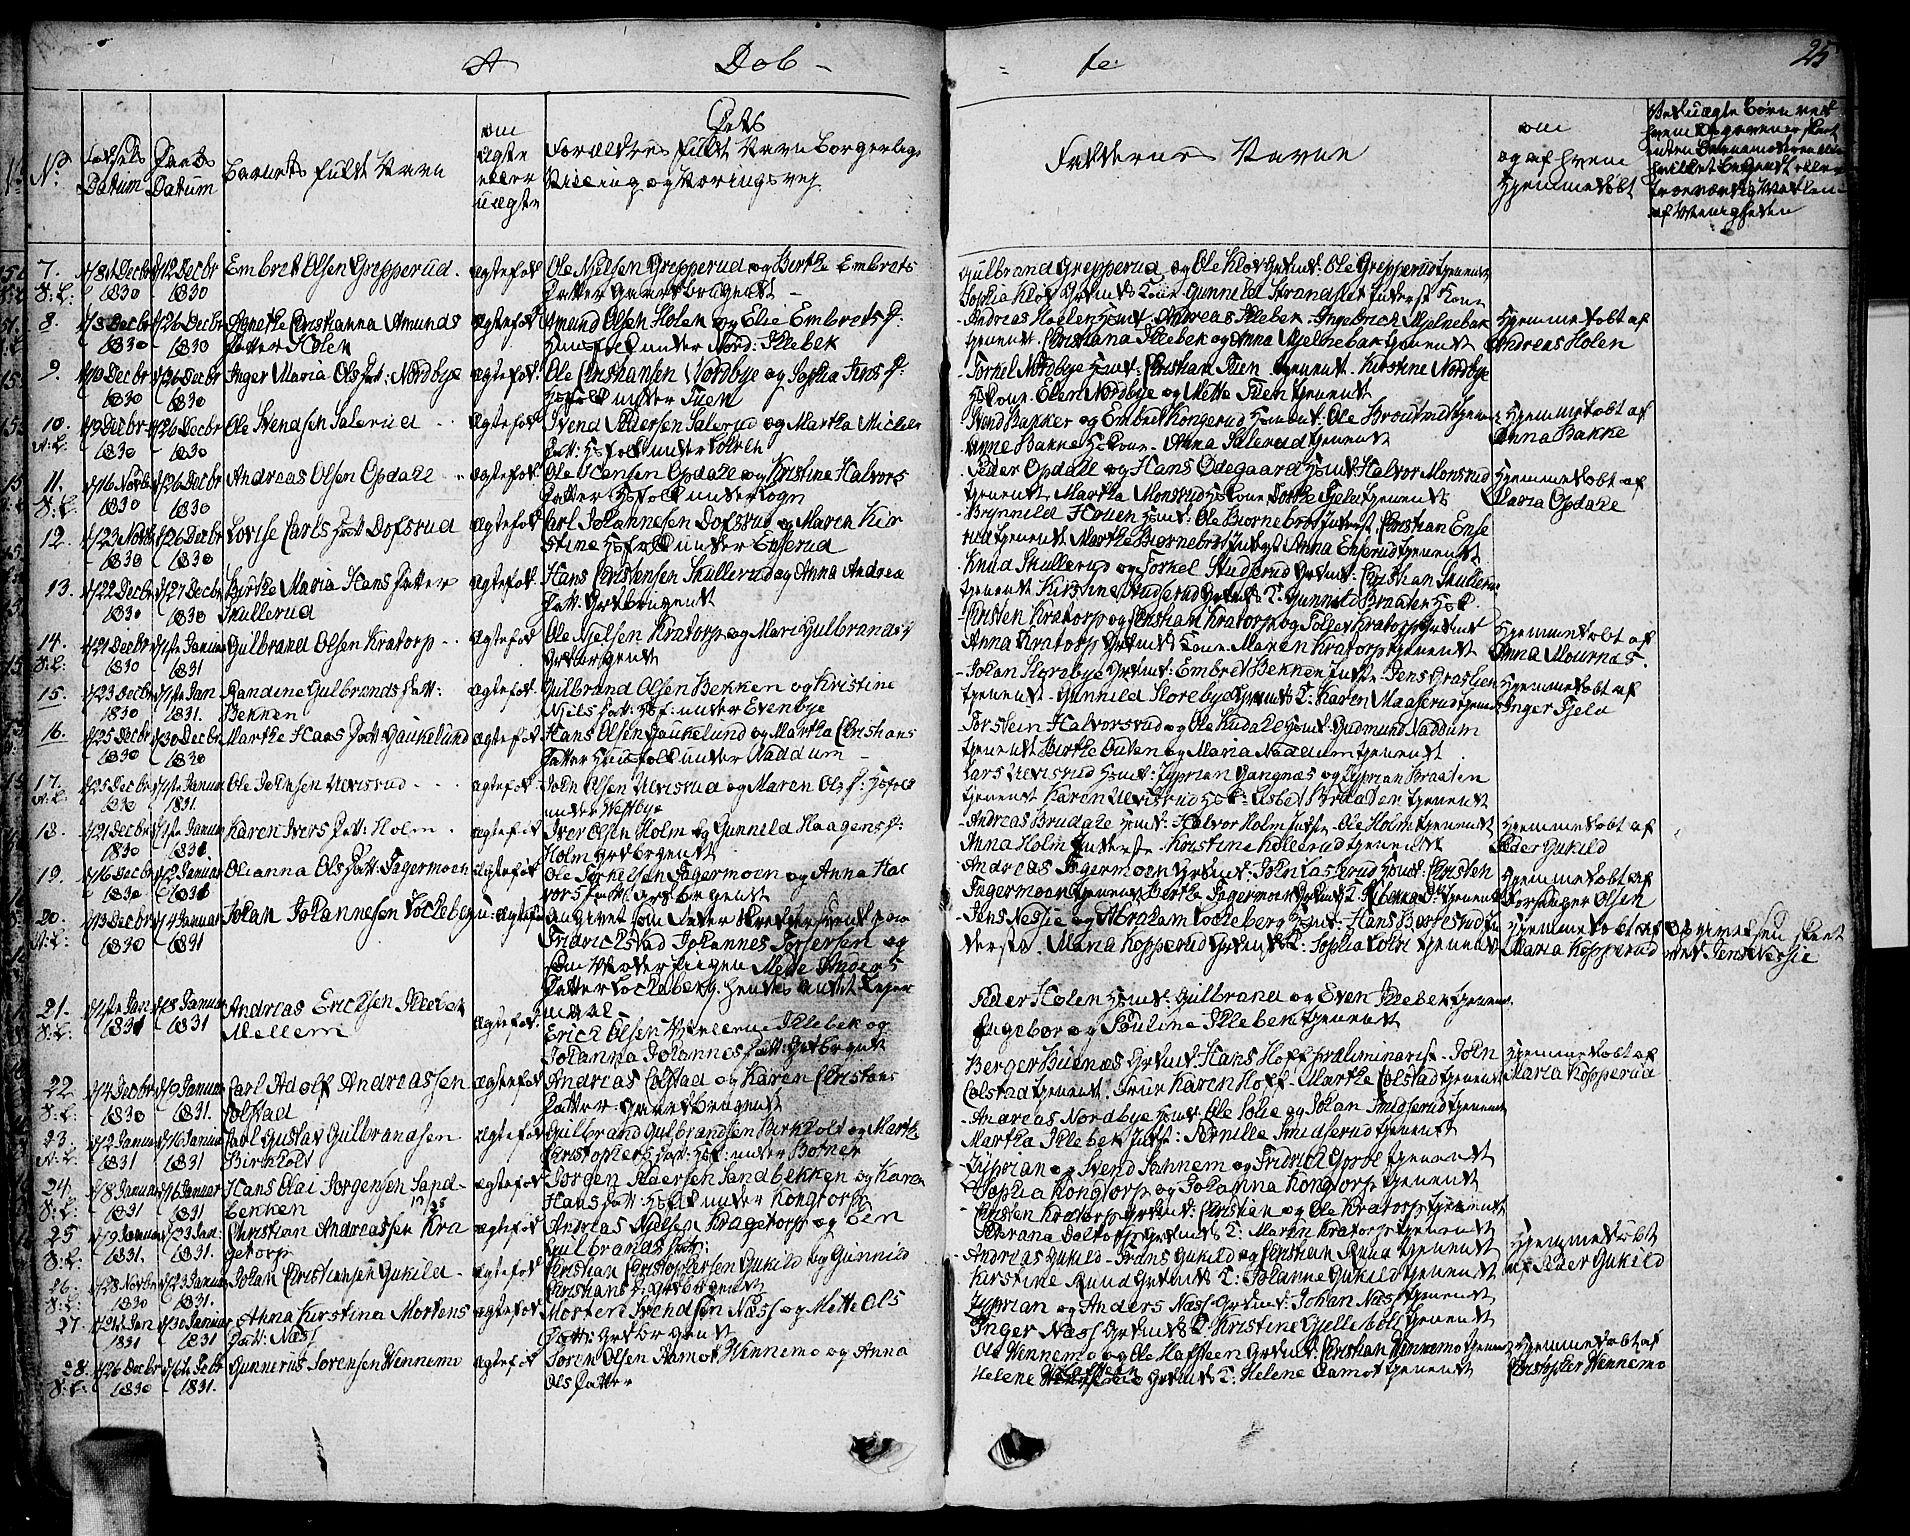 SAO, Høland prestekontor Kirkebøker, F/Fa/L0008: Ministerialbok nr. I 8, 1827-1845, s. 25